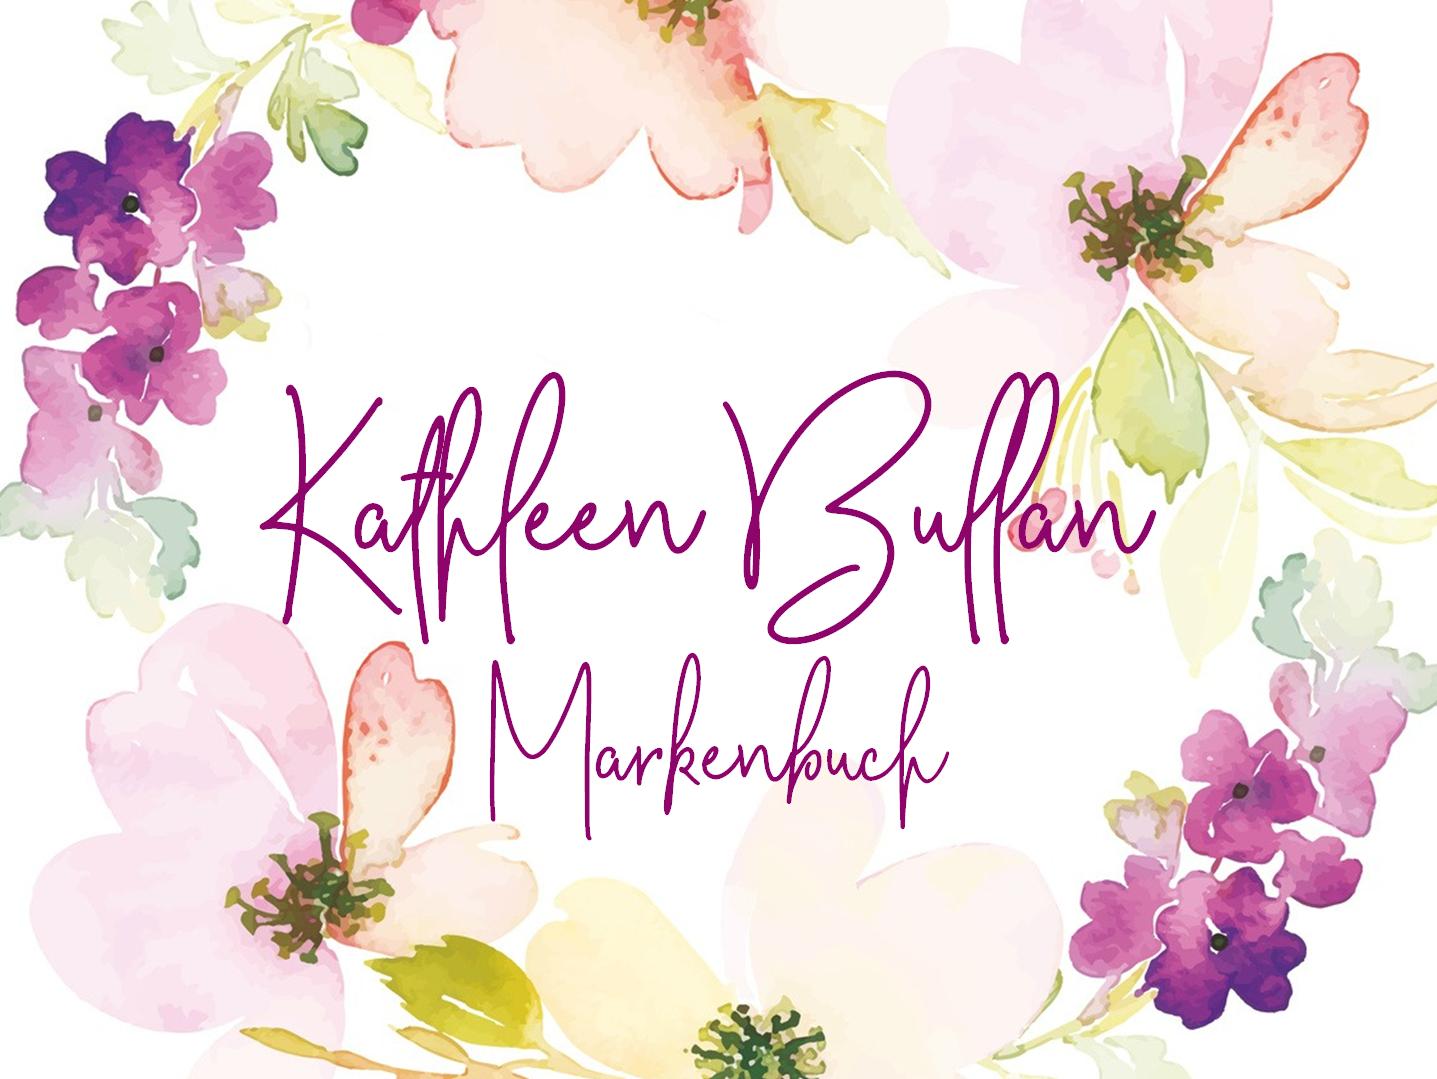 Kathleen B. Markenbuch